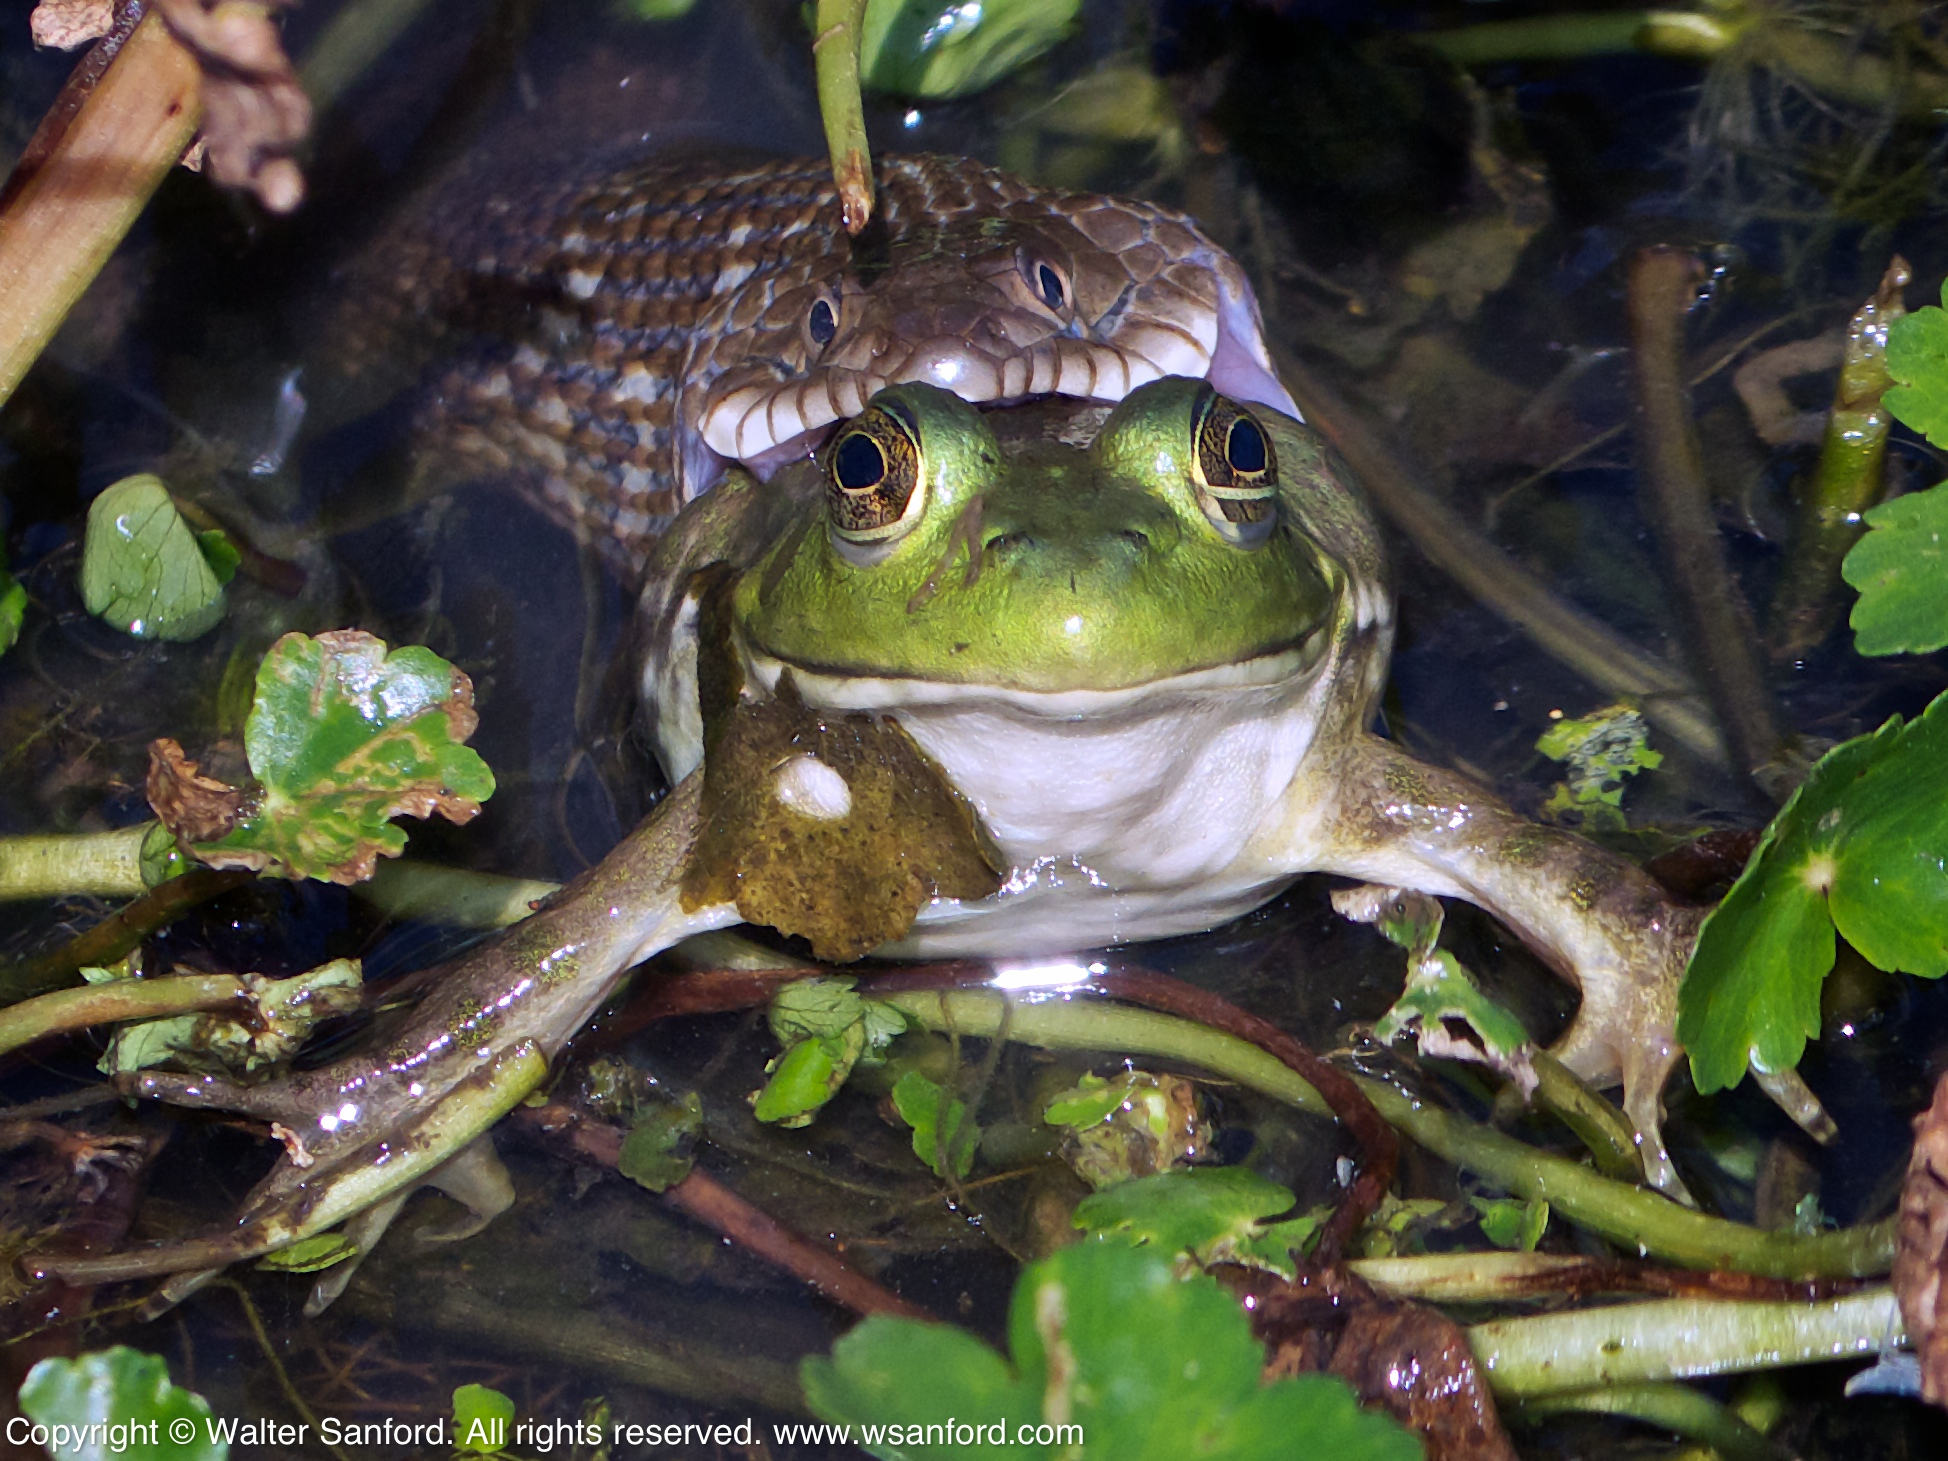 Frog Eating Girl